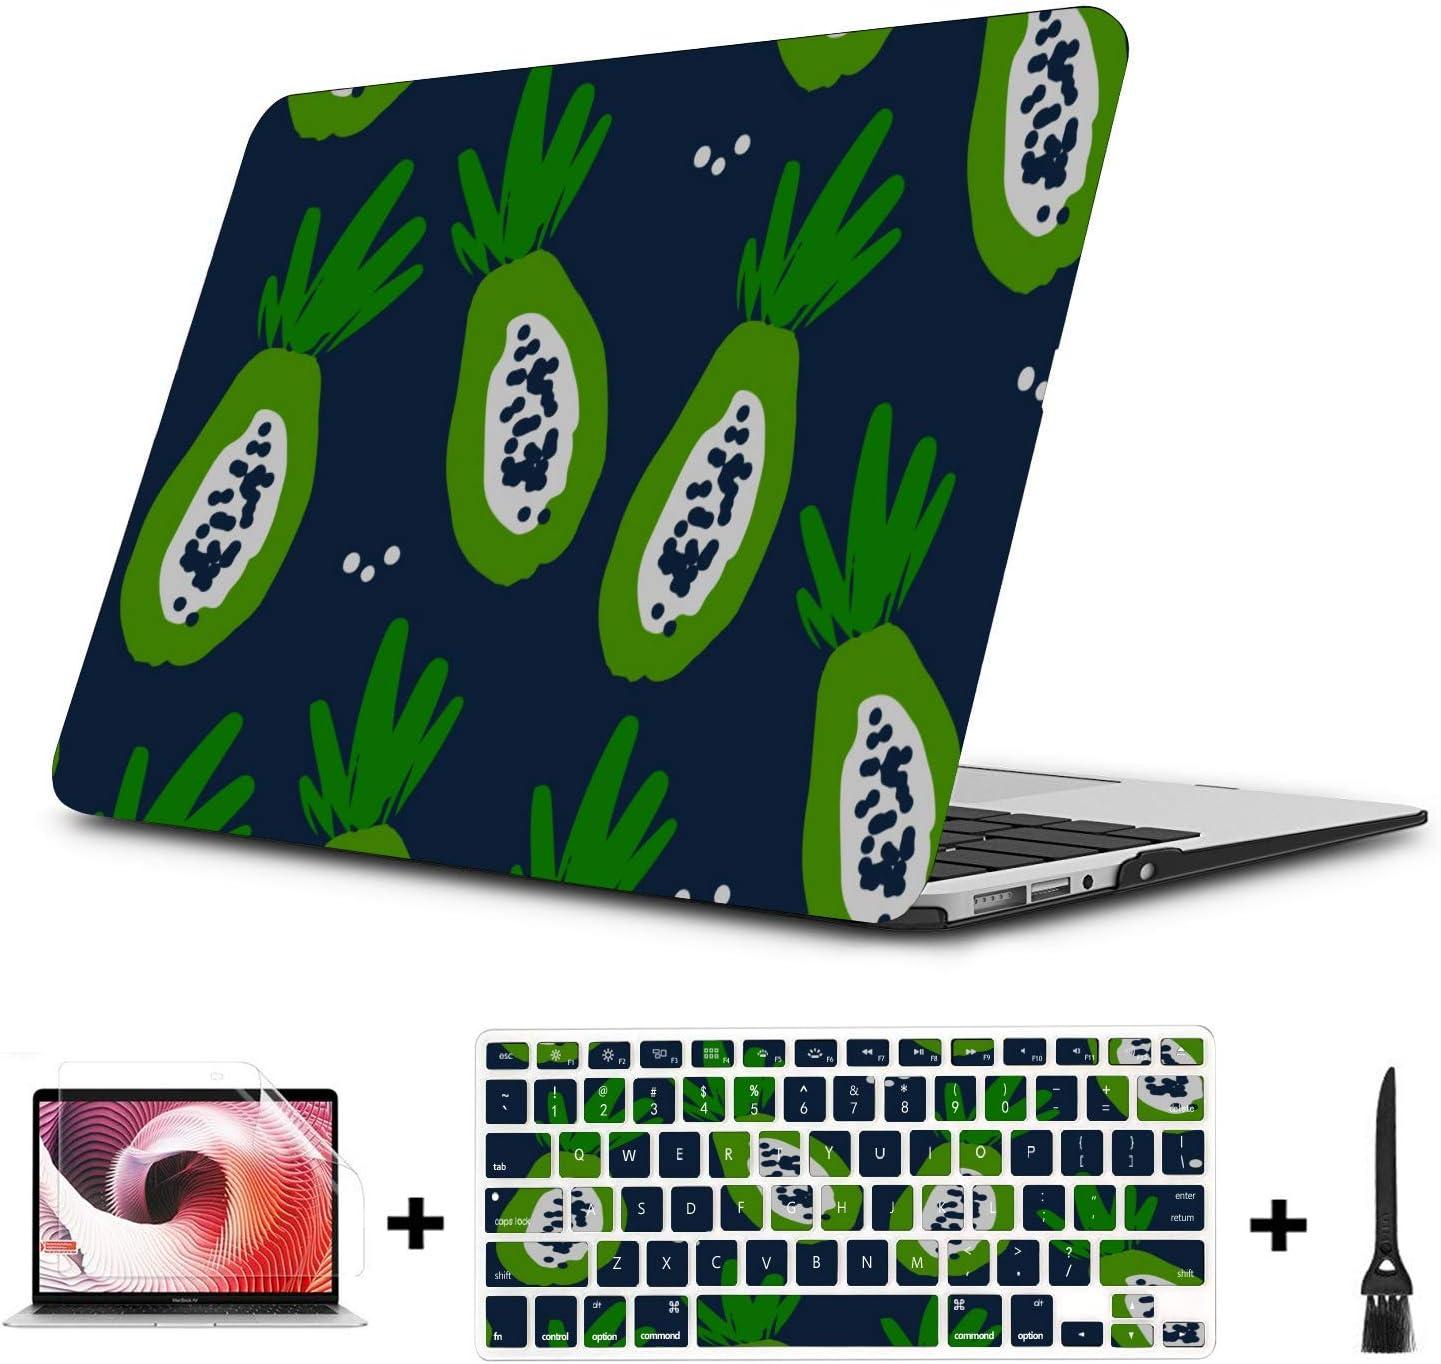 MacBook Accessories Case Summer Fashion Cool Fruit Papaya Plastic Hard Shell Compatible Mac Air 11 Pro 13 15 13 MacBook Air Case Protection for MacBook 2016-2019 Version